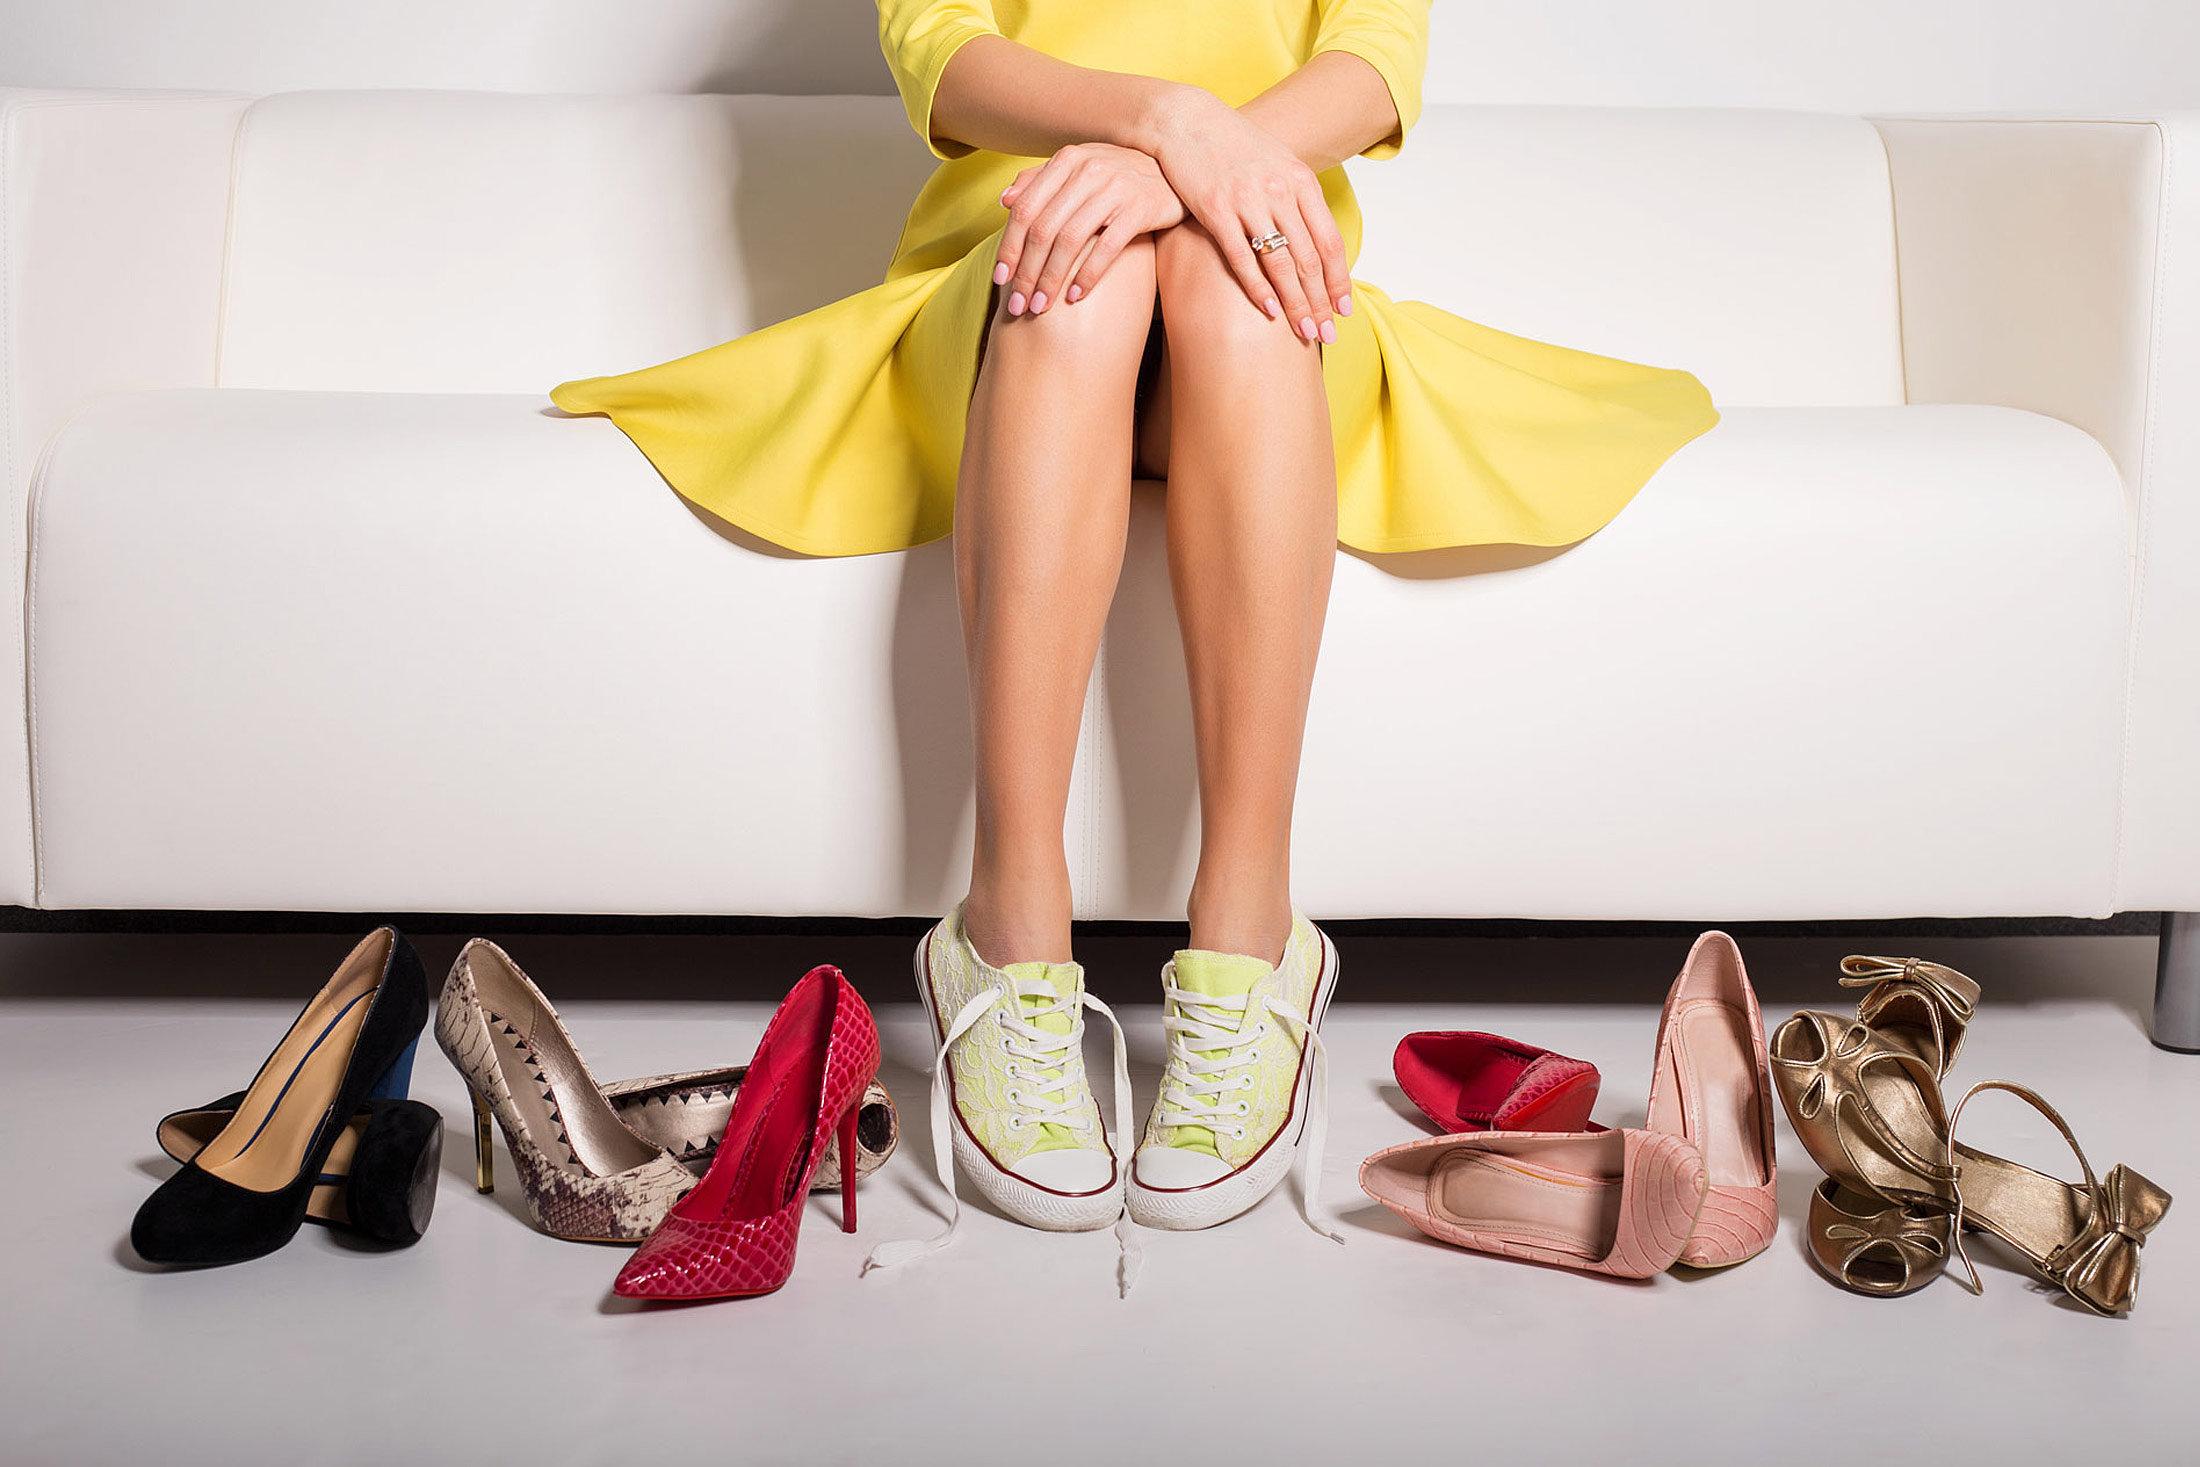 KERN Schuhe | Mode | Lifestyle Mindelheim